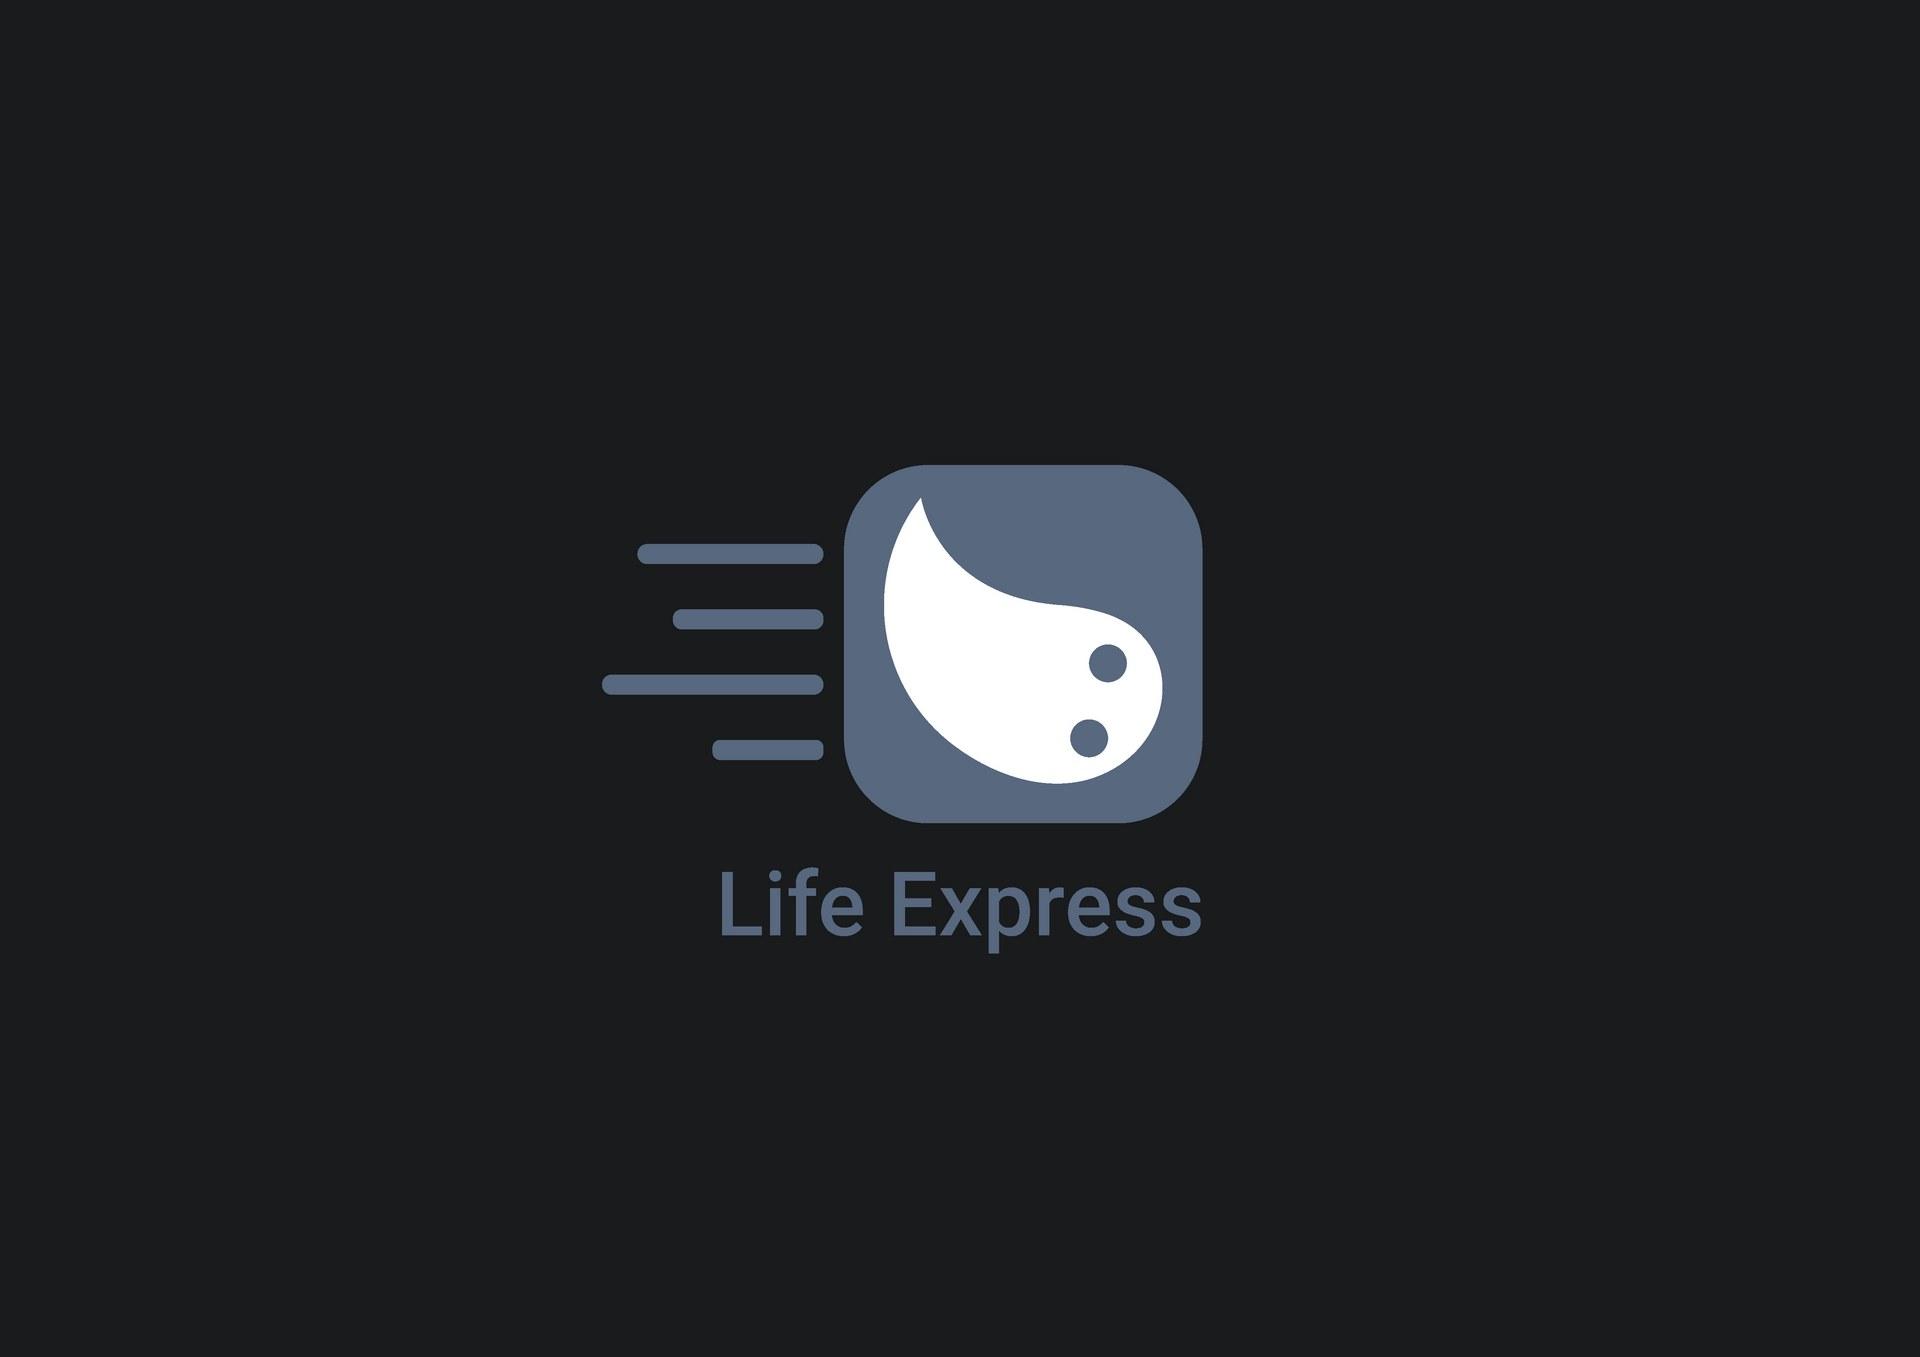 Logo of Life Express